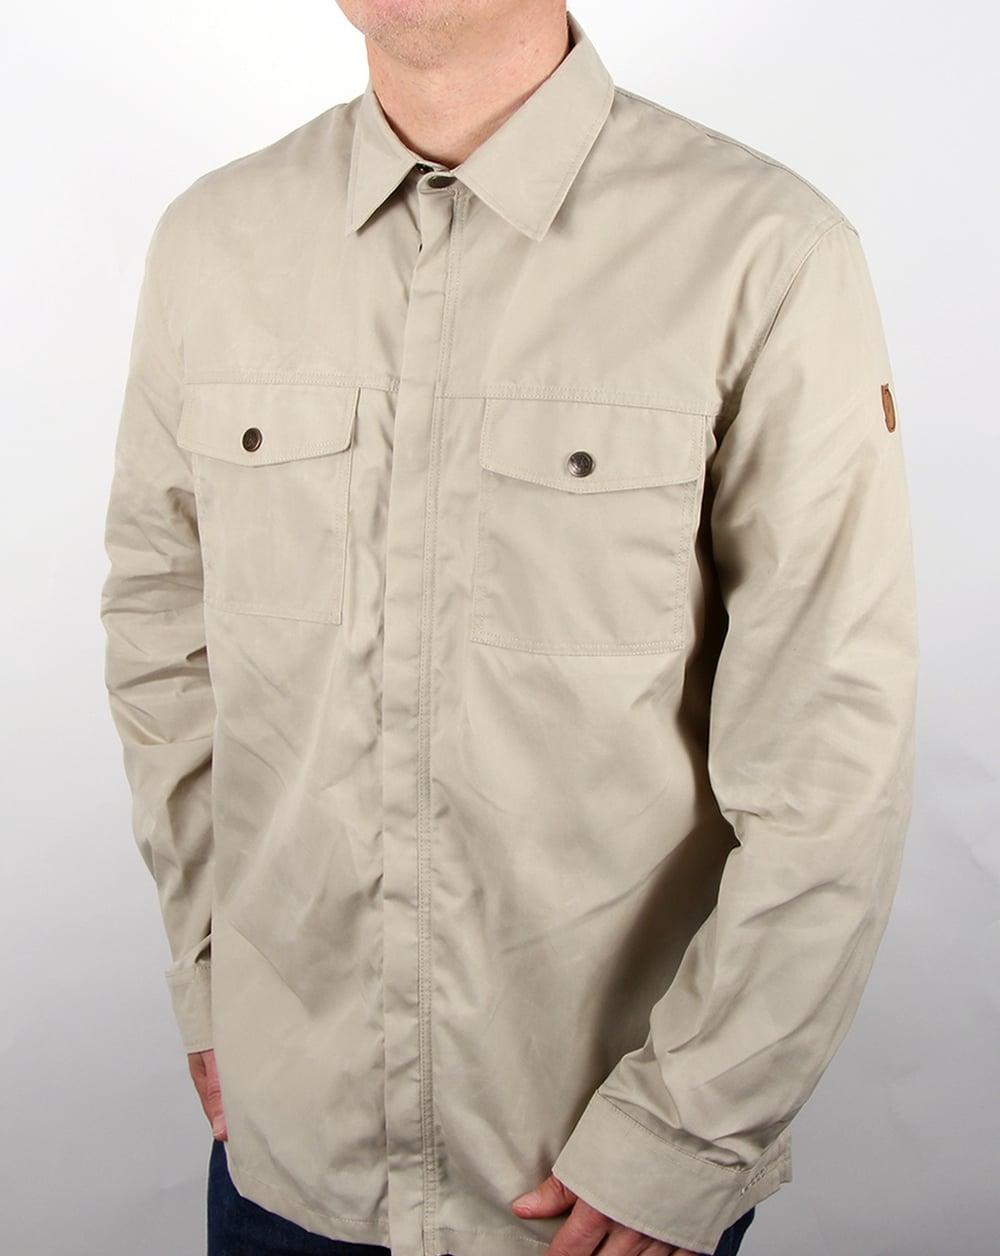 online store b80de 672da Fjallraven G-1000 Shirt Limestone